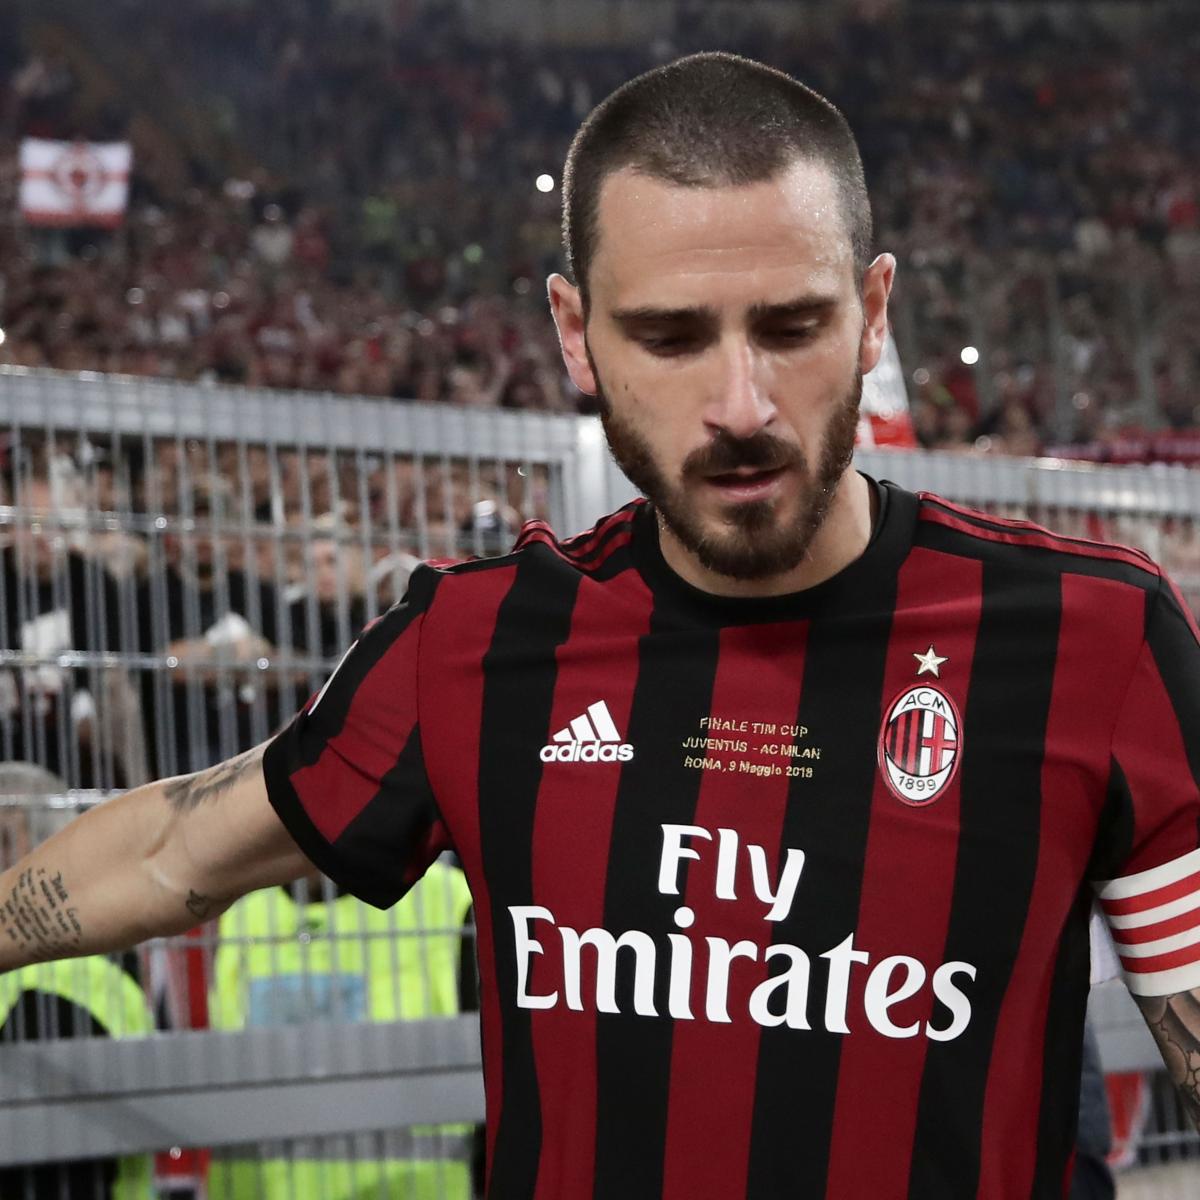 Manchester United Transfer News: Latest Rumours on Leonardo Bonucci